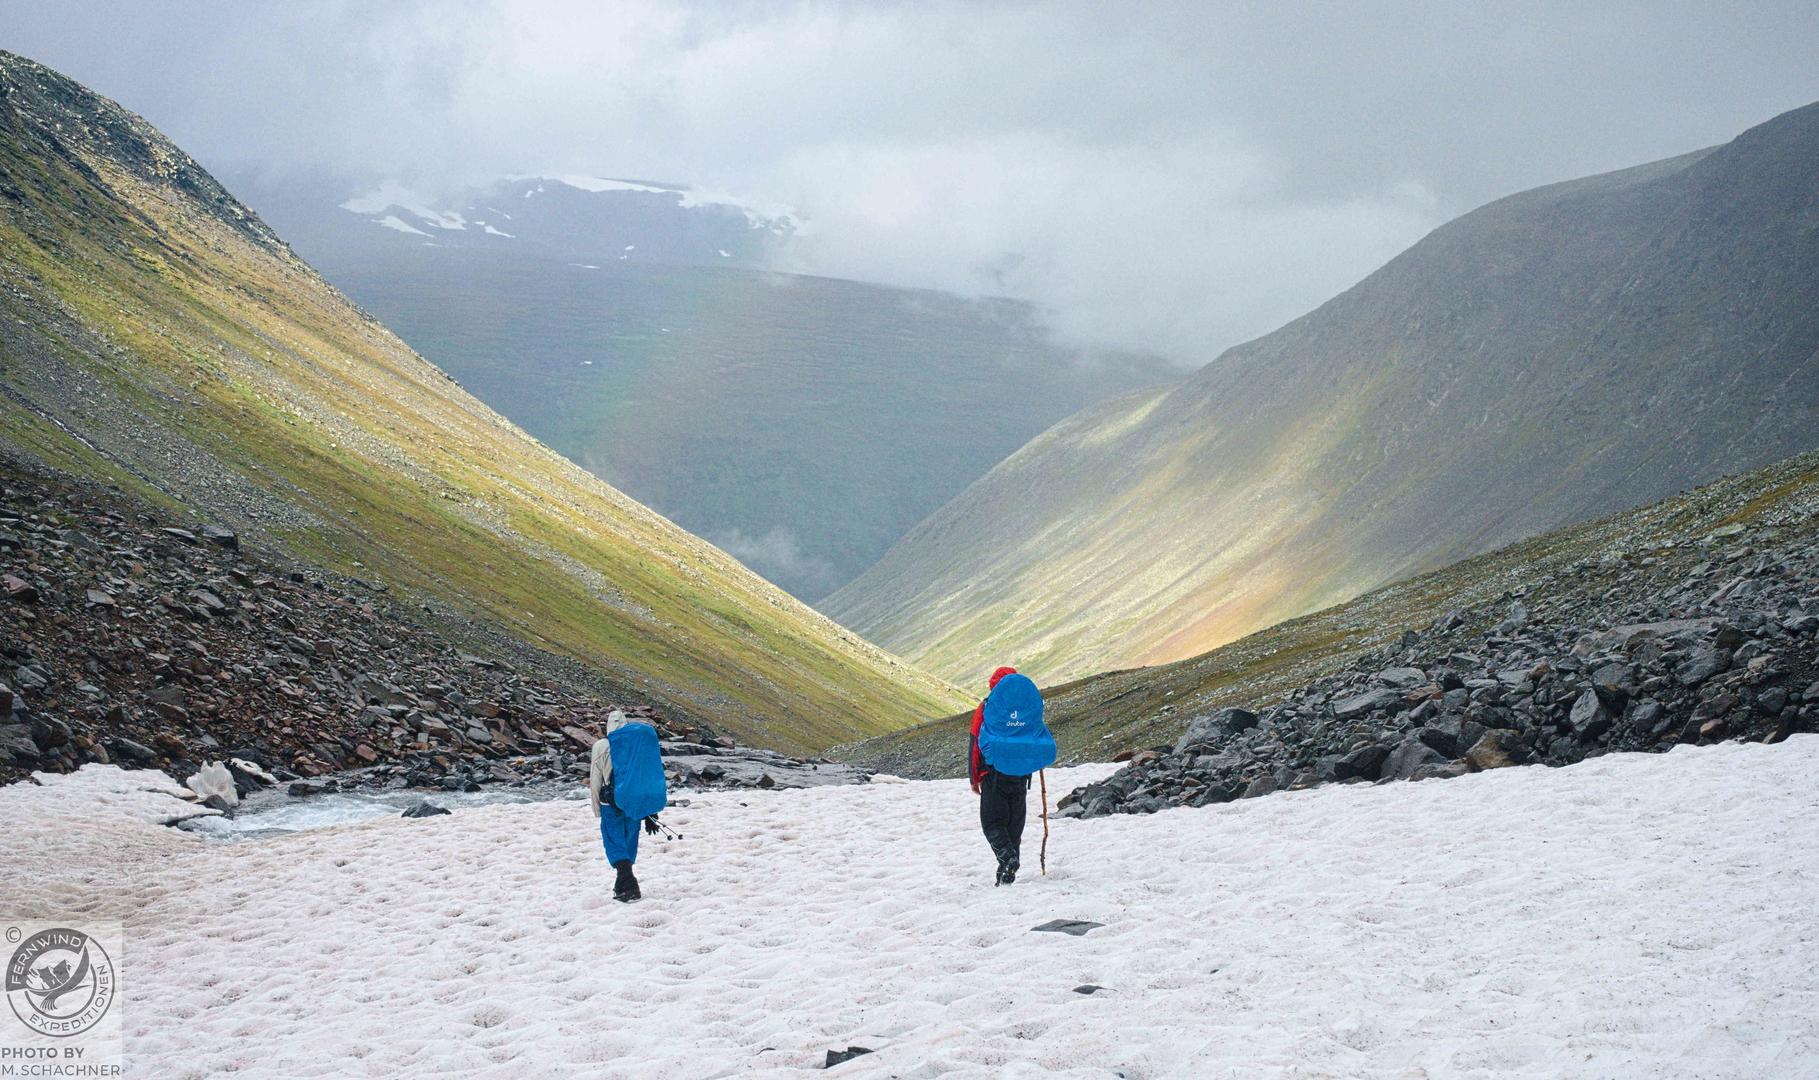 fernwind schweden sarek scouting trekking expedition Schneefeld Regenbogen